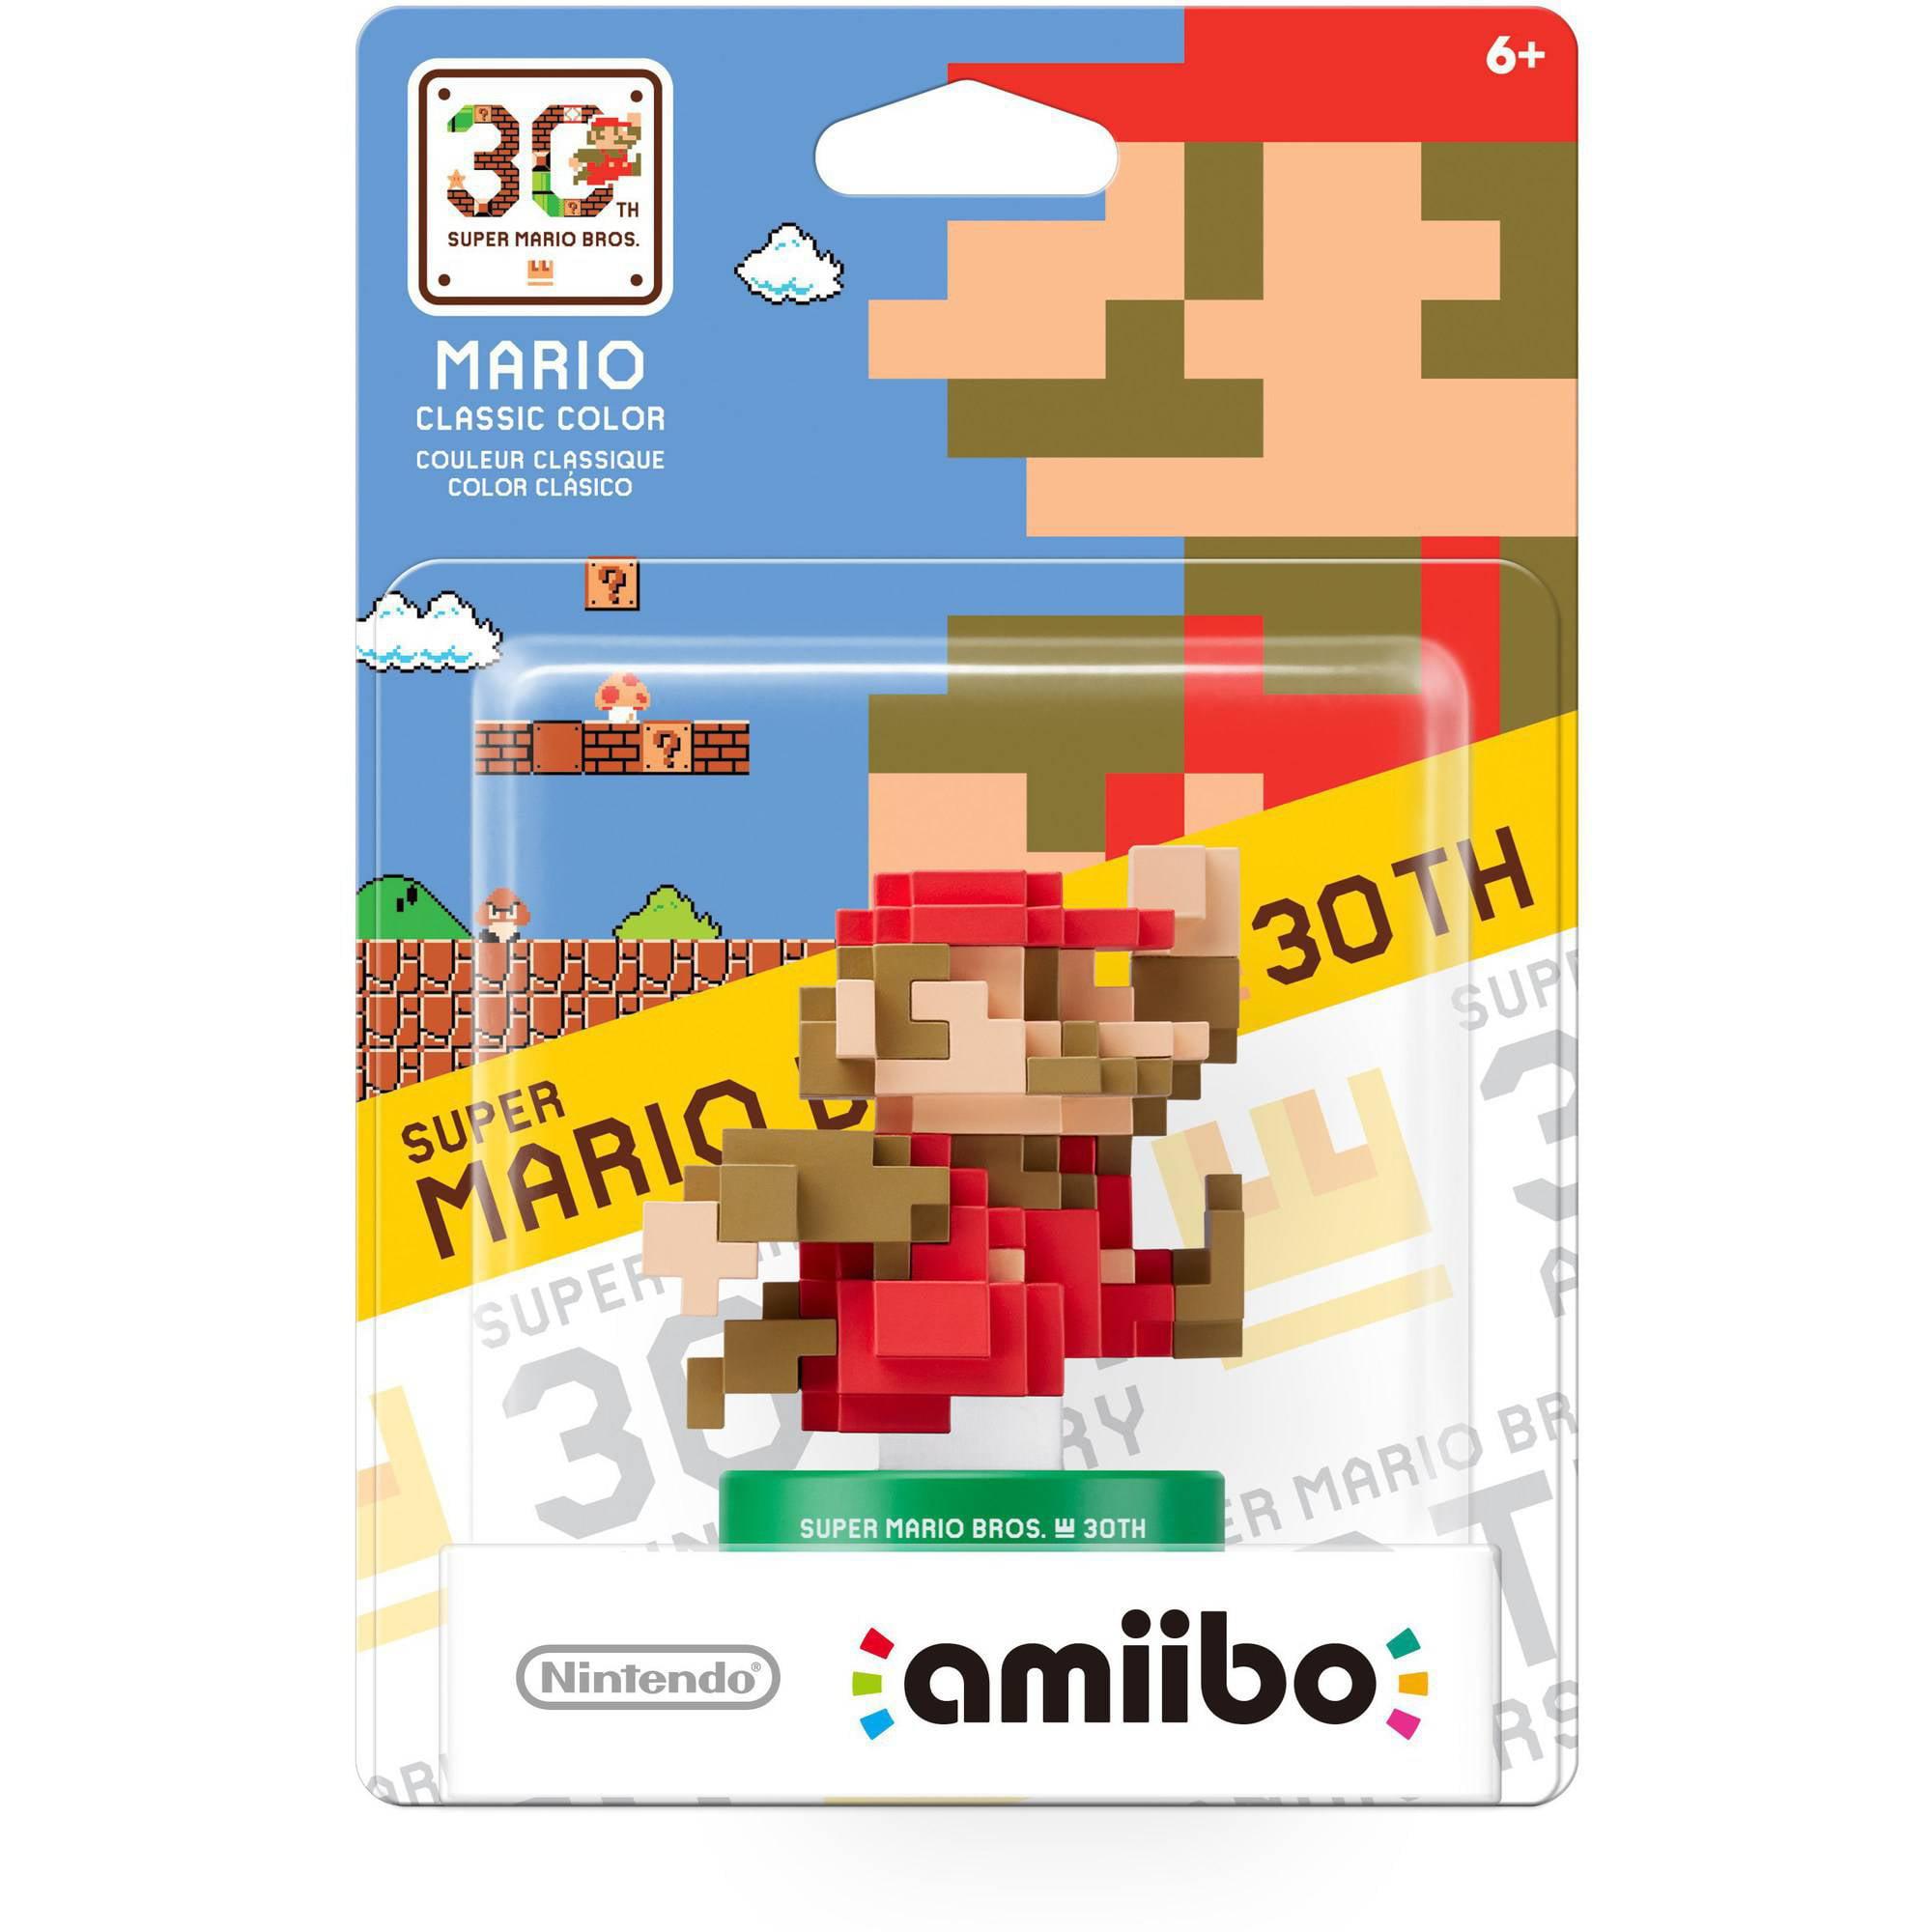 Mario Classic Color 30th Anniversary Series amiibo (Nintendo WiiU or New Nintendo 3DS)